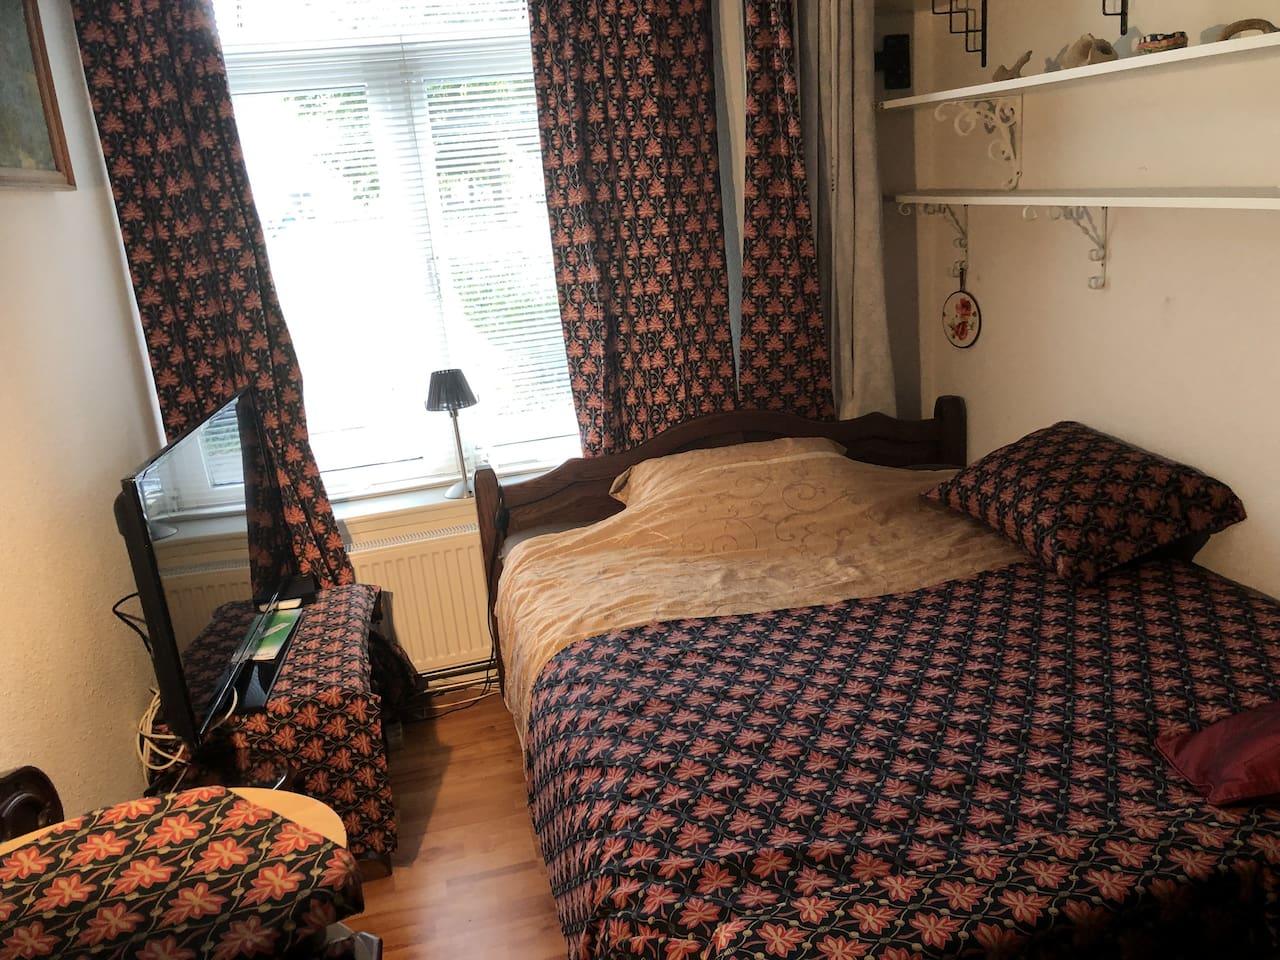 Laura Aschley room met hemelbed